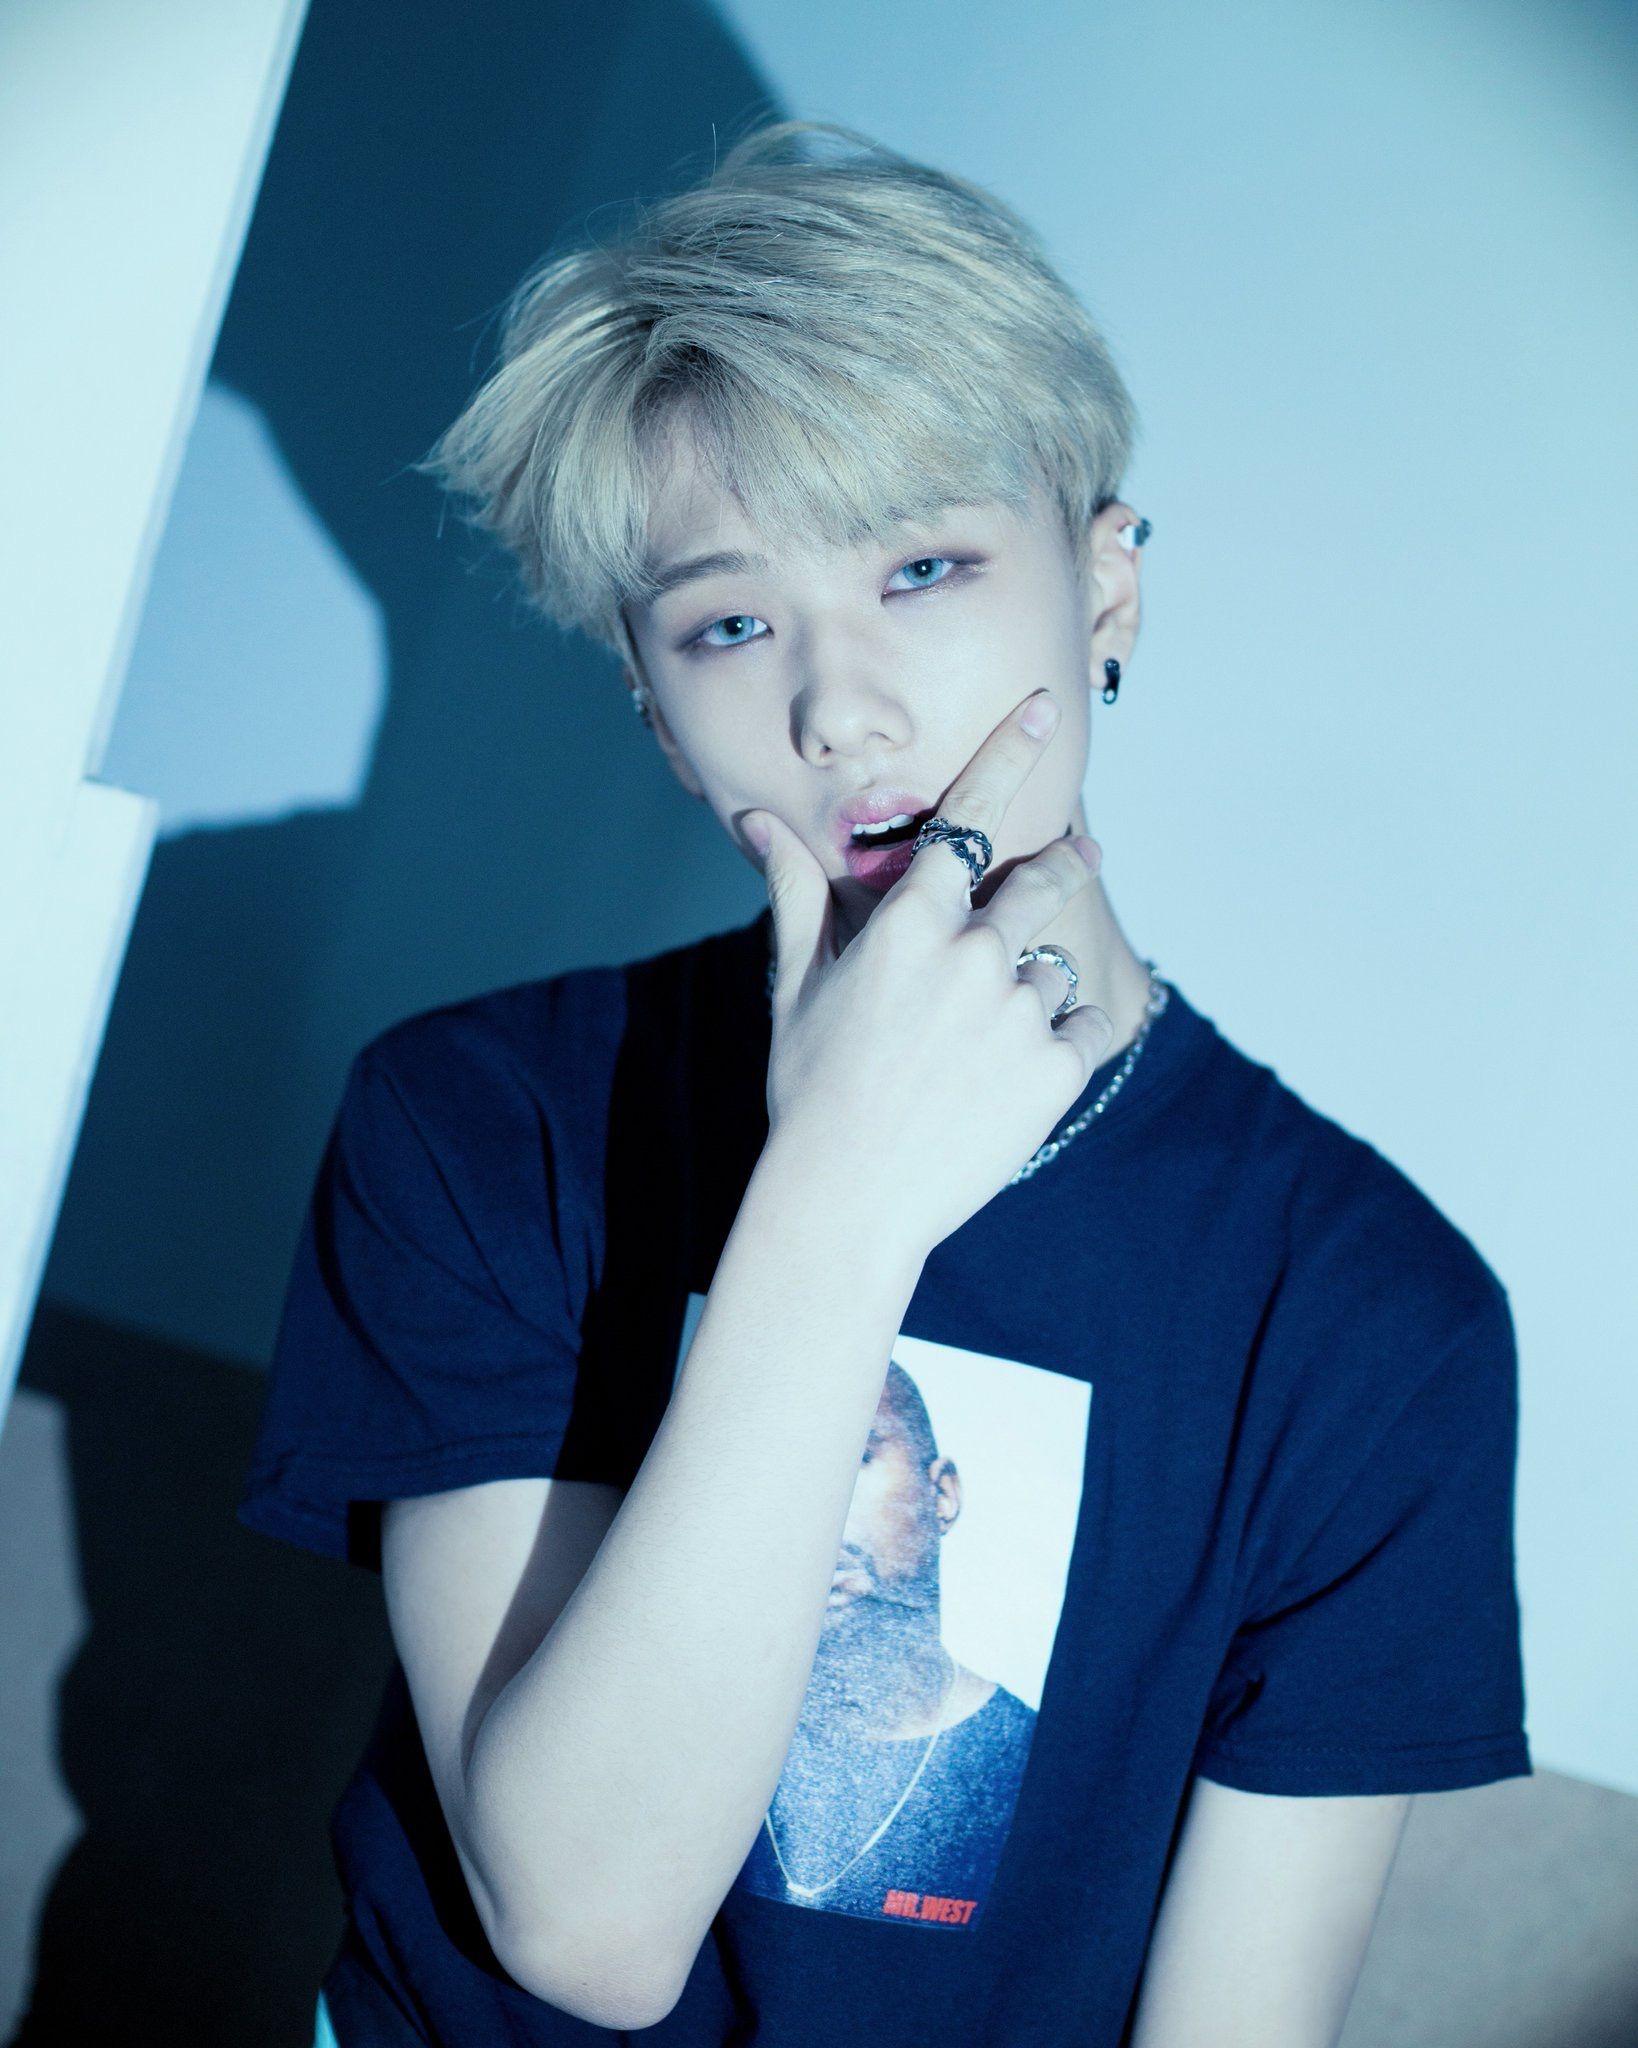 NCT Jisung | NCT | Jisung nct, NCT i Park jisung nct